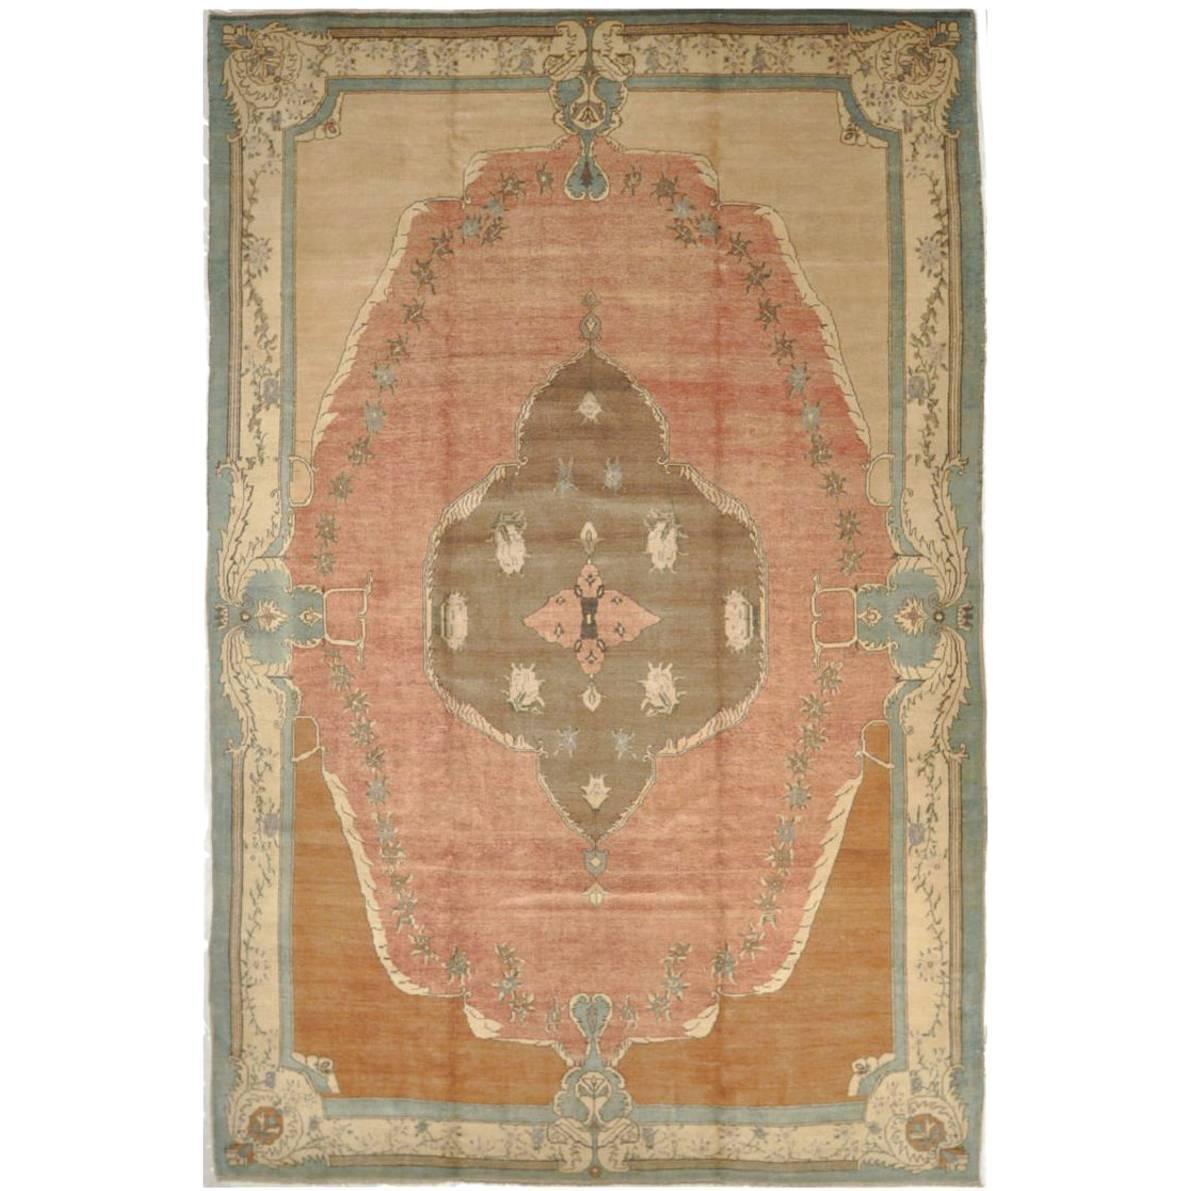 Large Room Size Savonnerie Design Turkish Rug For Sale At